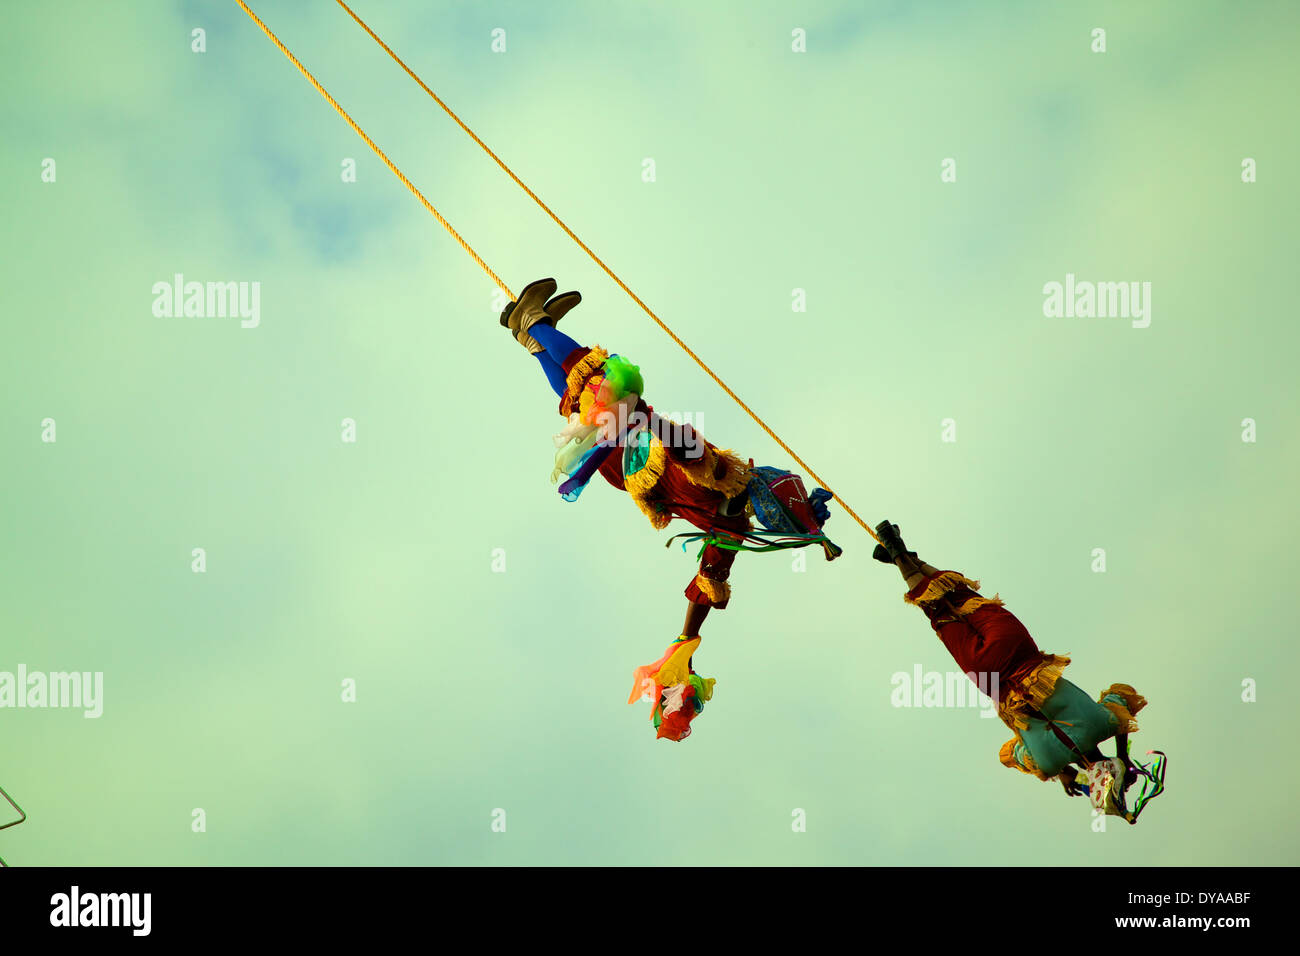 Otomi Stock Photos & Otomi Stock Images - Page 3 - Alamy